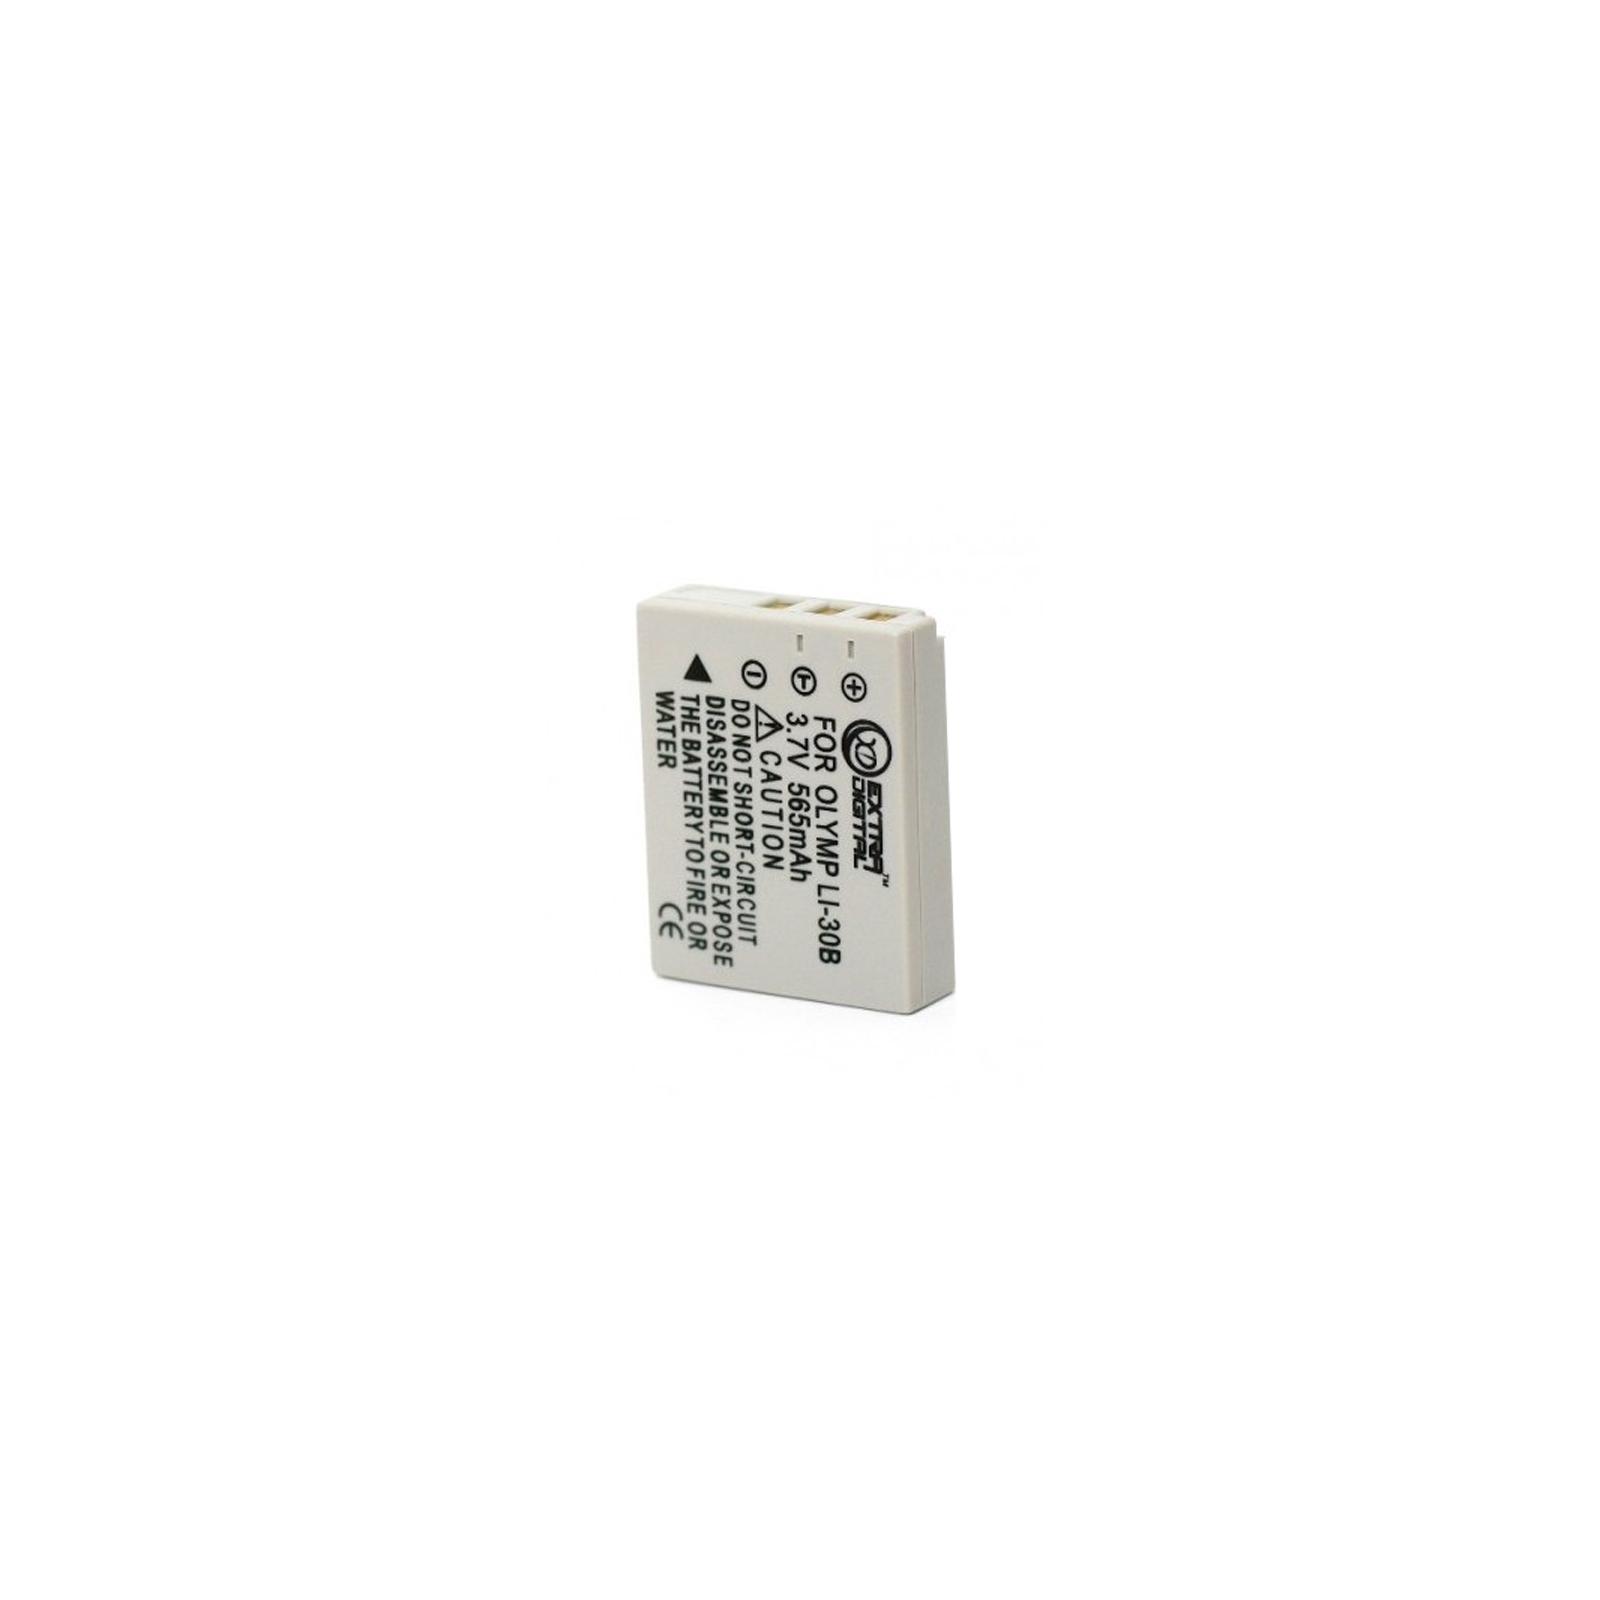 Аккумулятор к фото/видео EXTRADIGITAL Olympus Li-30B (DV00DV1058) изображение 2